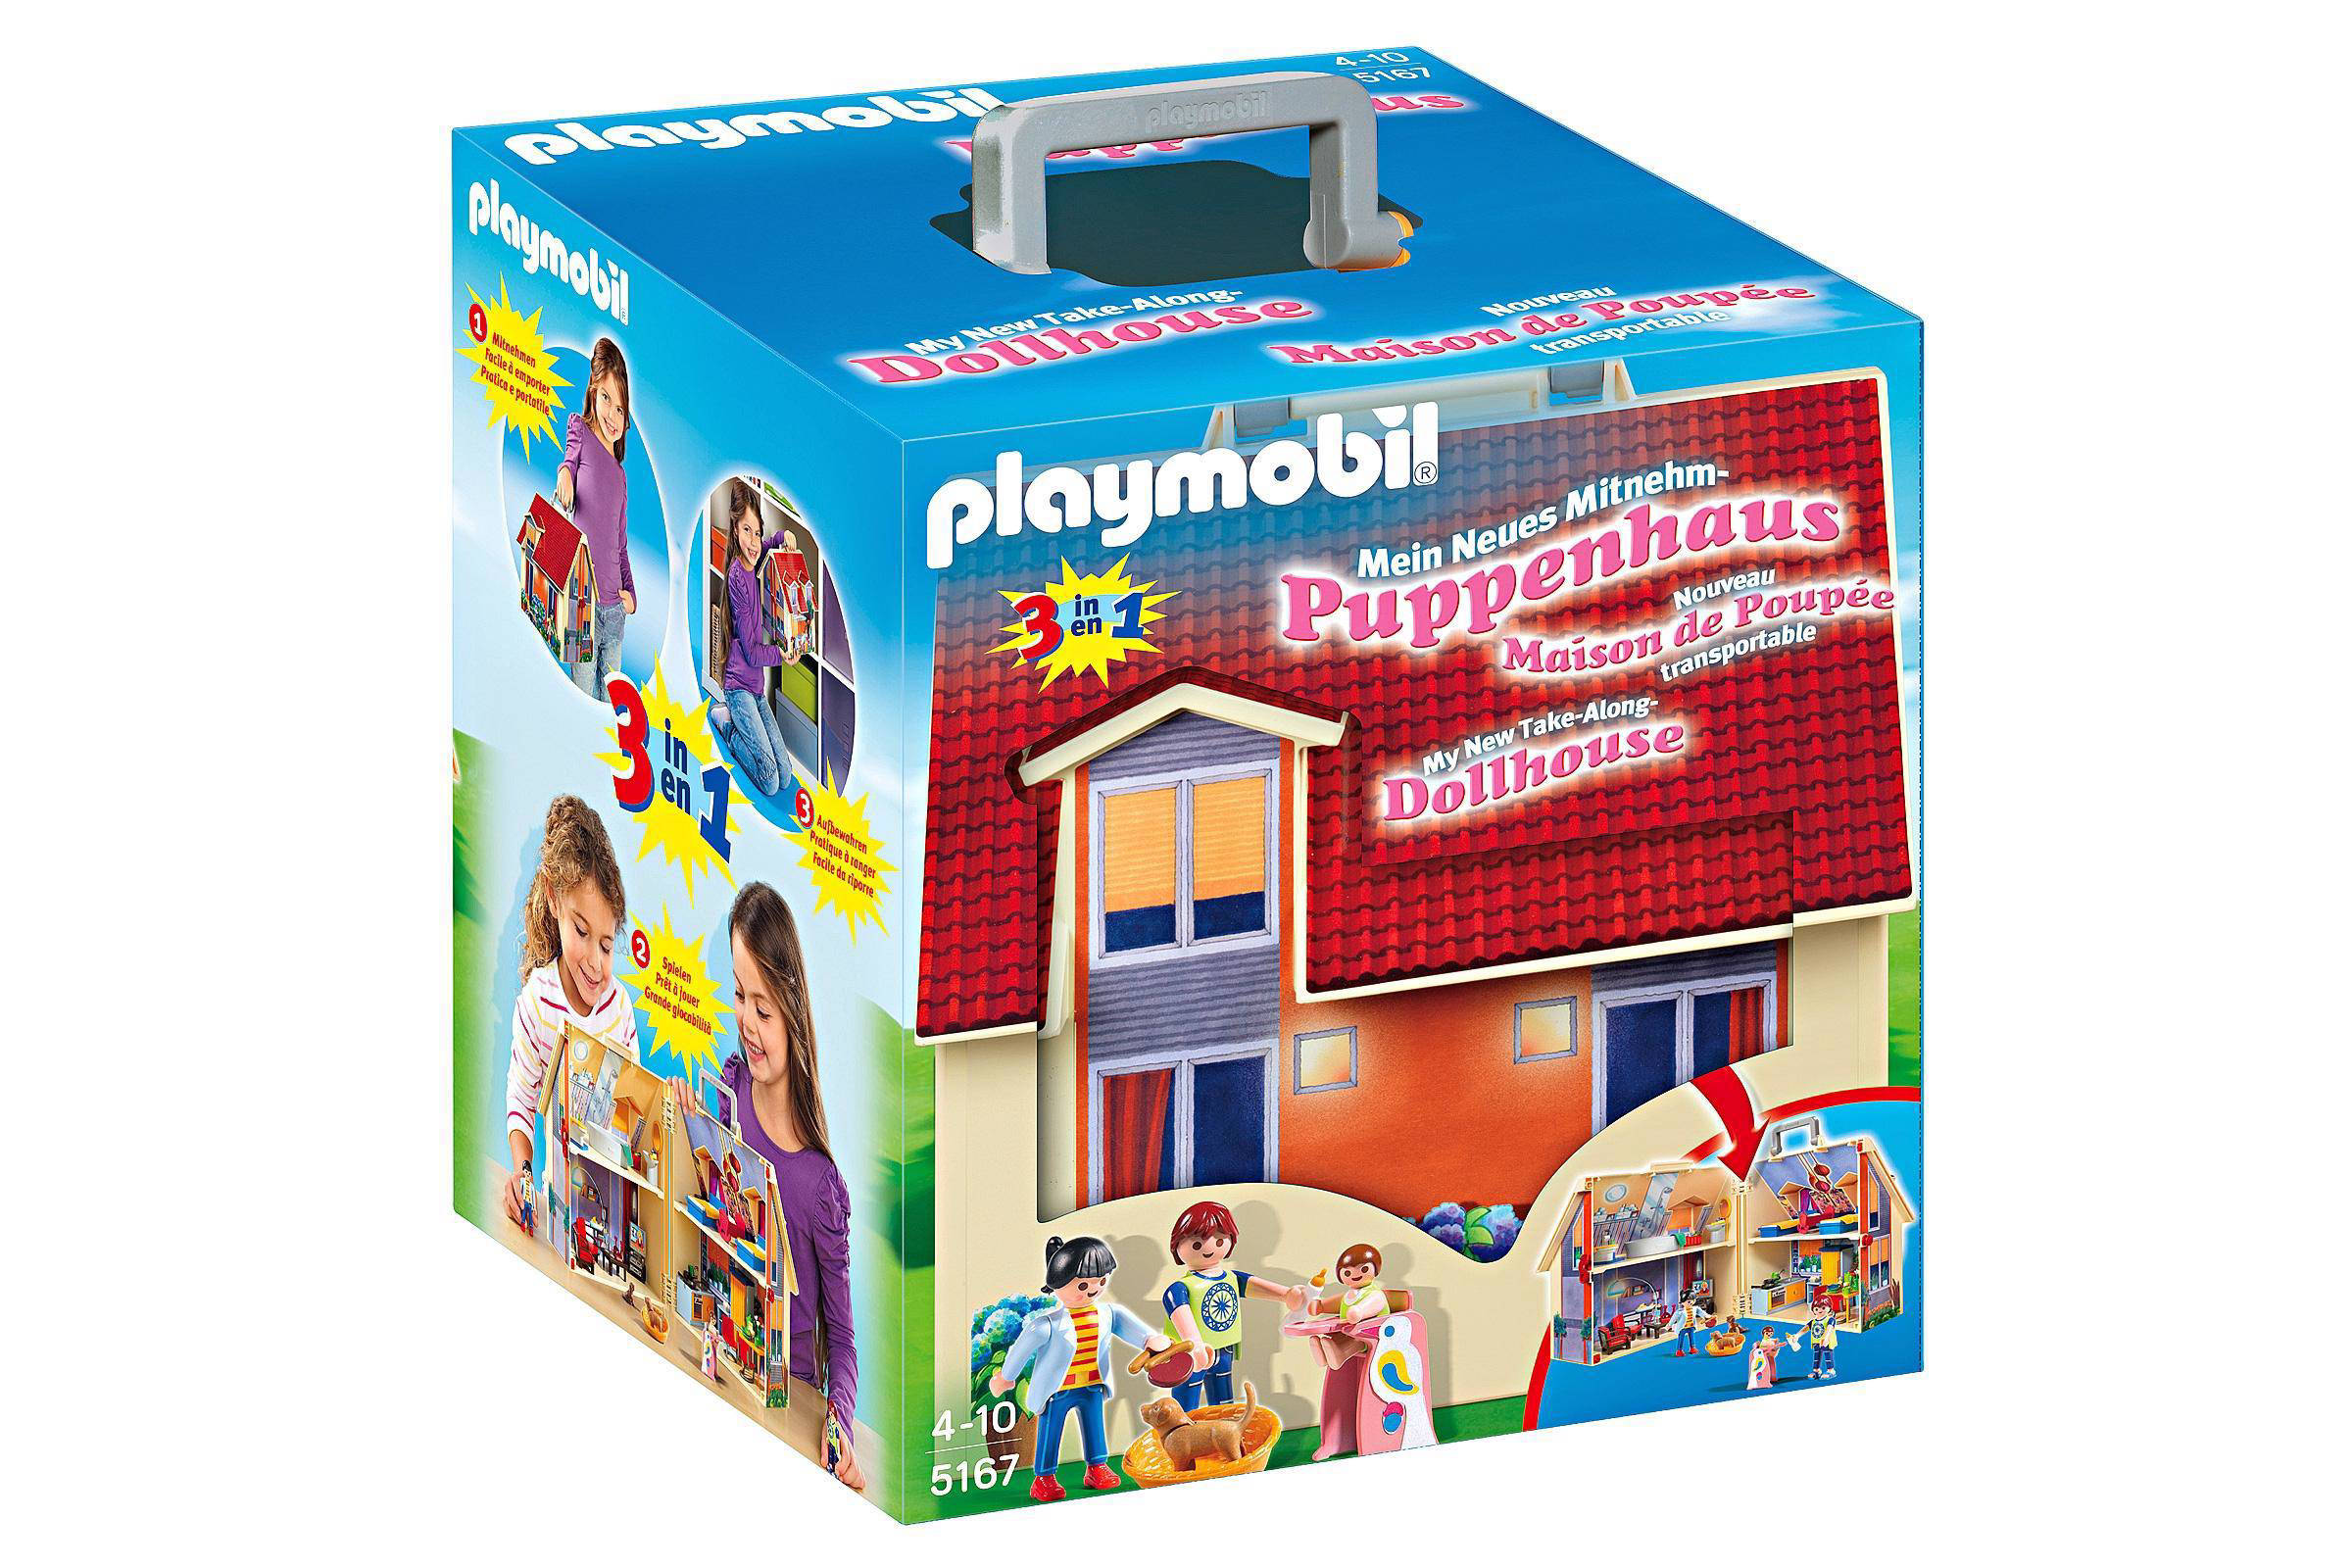 Playmobil Dollhouse bij wehkamp - Gratis bezorging vanaf 20.-